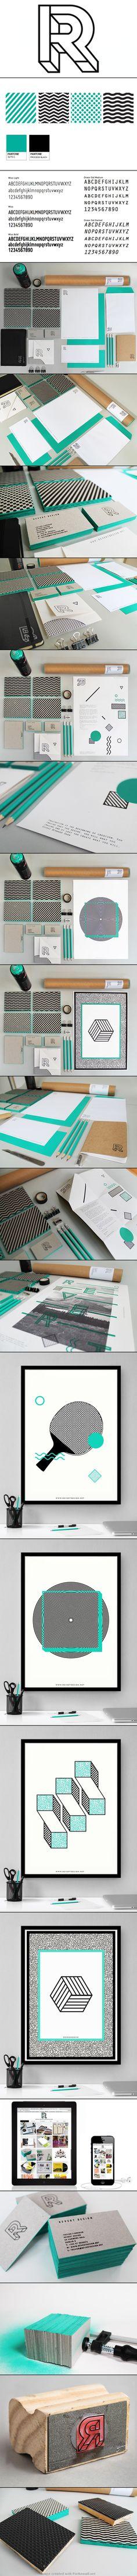 Revert Design #branding #identity #artdirection #graphicdesign